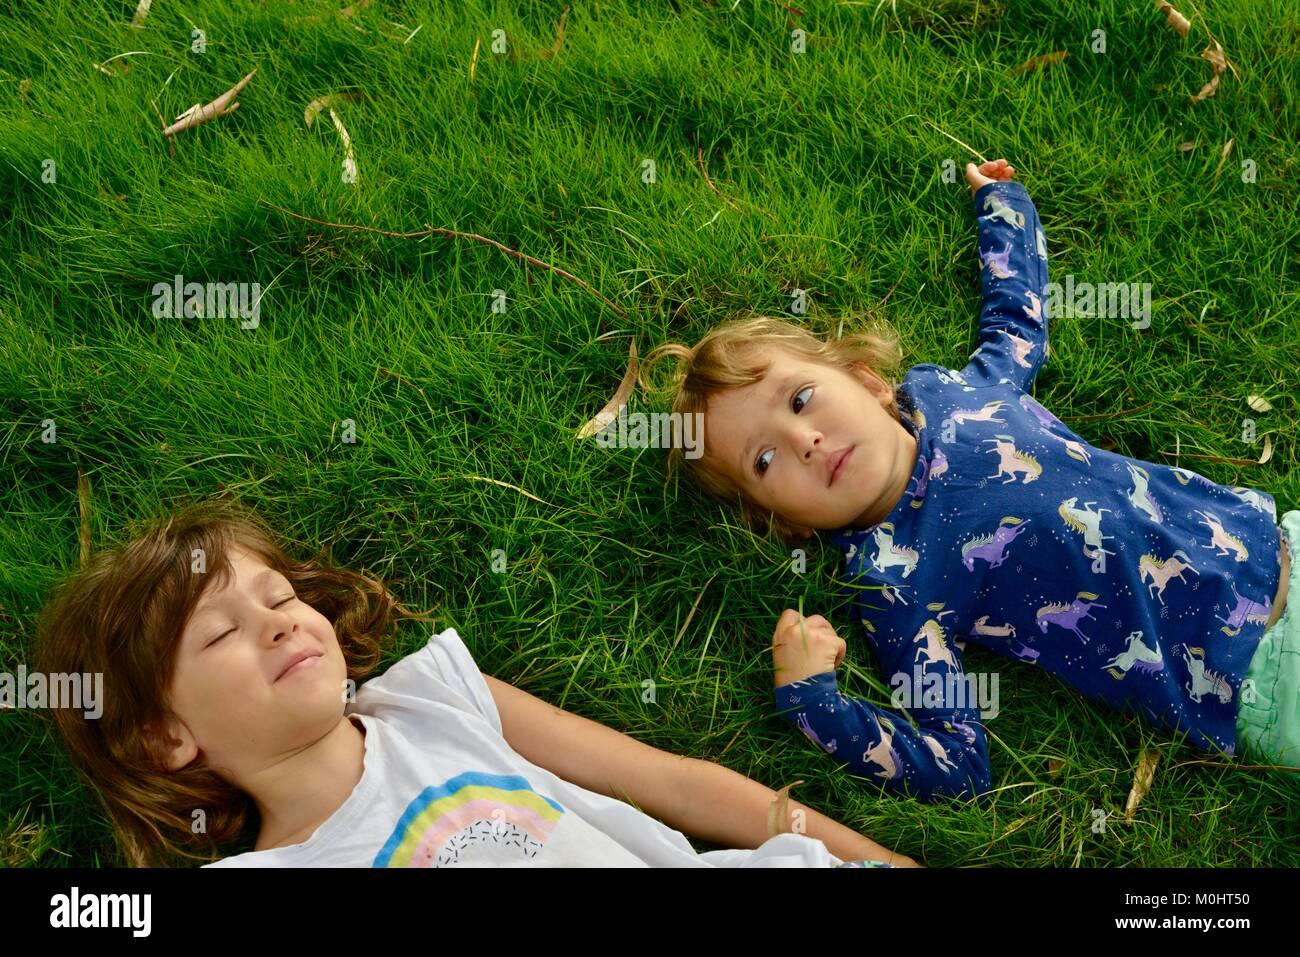 Two young girls lie on grass, portrait, Anderson Park Botanic Gardens, Townsville, Queensland, Australia Stock Photo